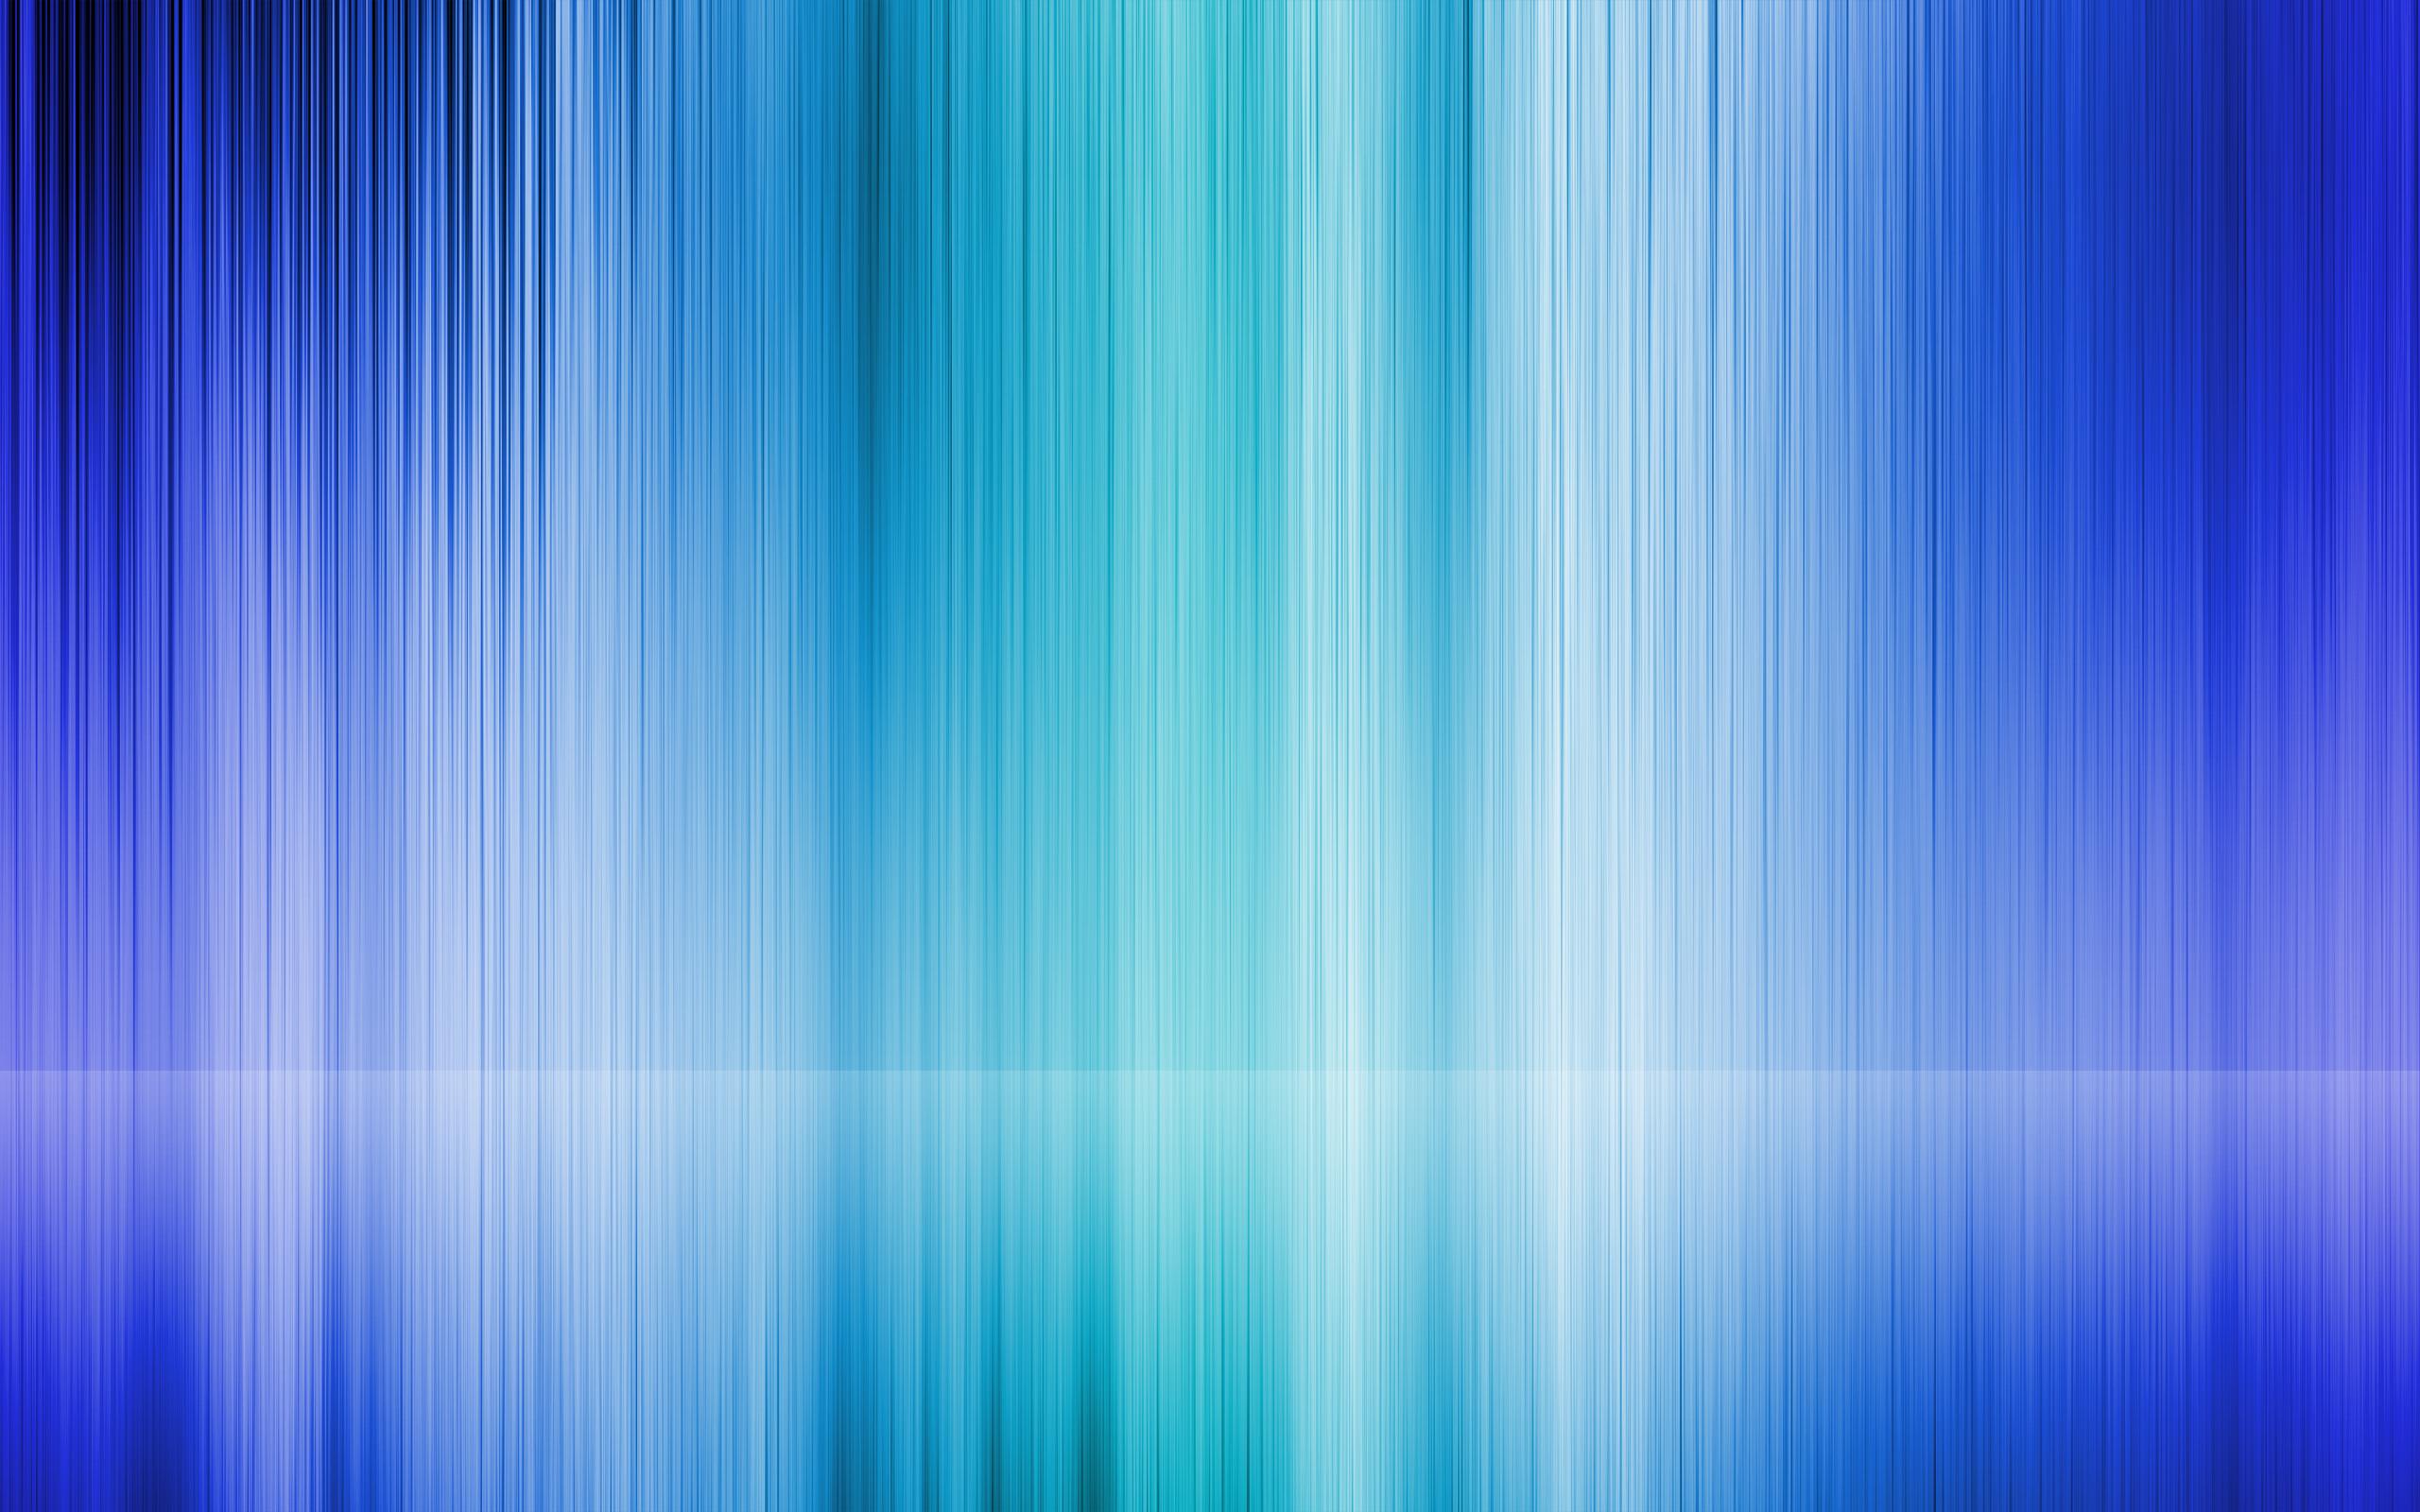 Pattern Computer Wallpapers Desktop Backgrounds